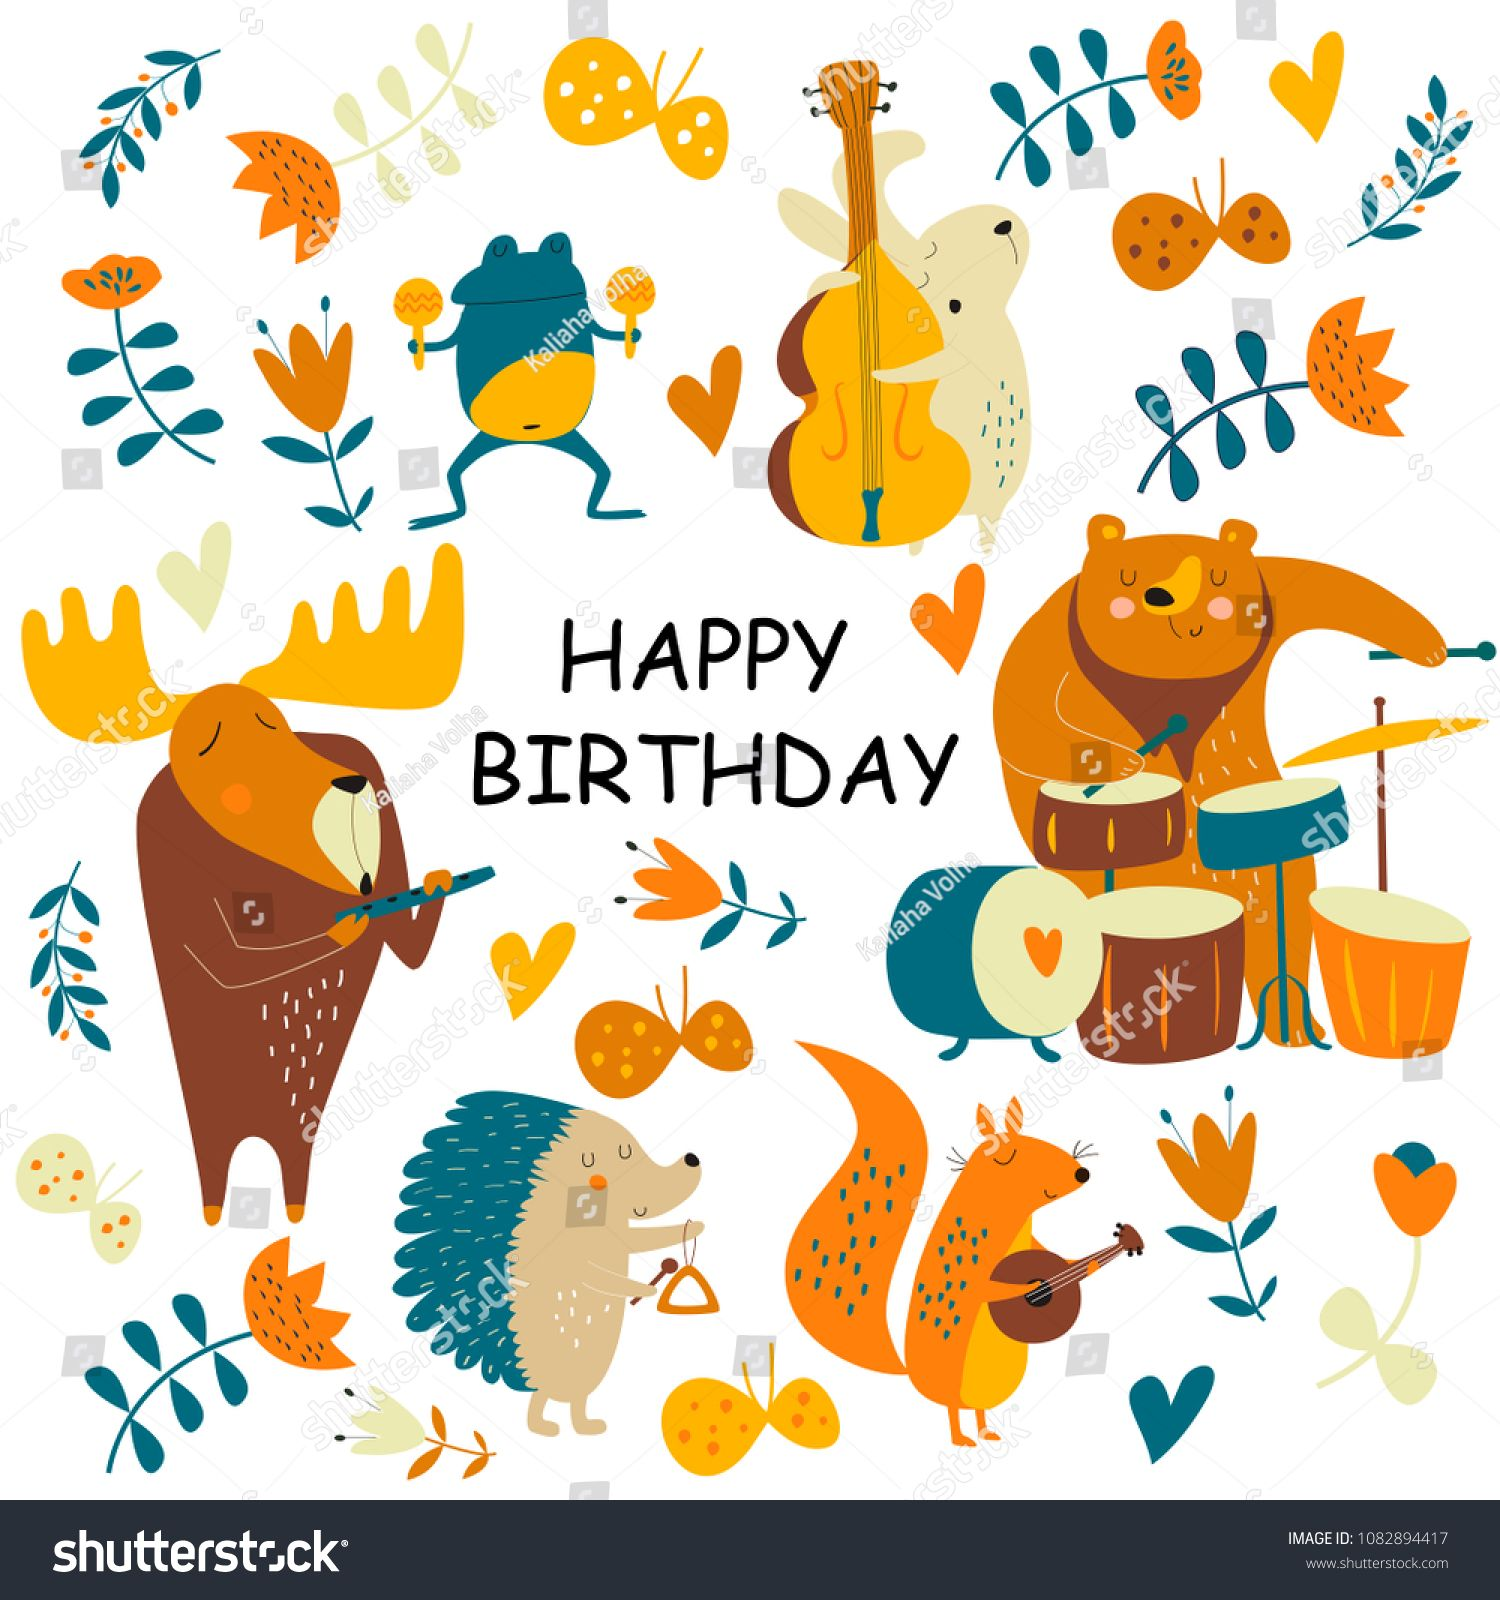 Birthday Card With Cute Animals Playing The Musical Instruments Cartoon StylecuteanimalsBirthdaycard